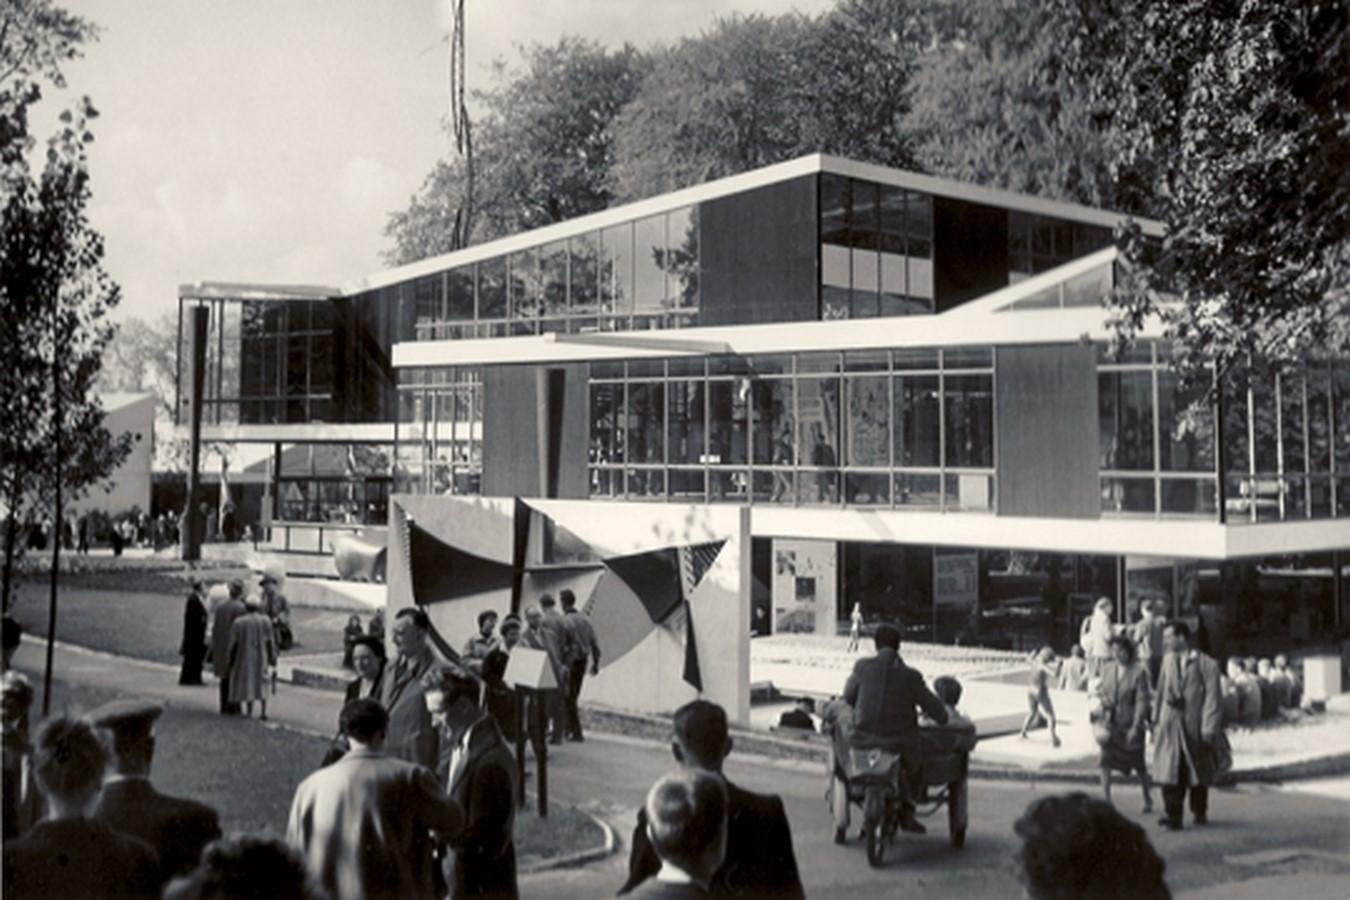 Yugoslavia Pavilion in Brussels World's Fair, 1958 - Sheet2